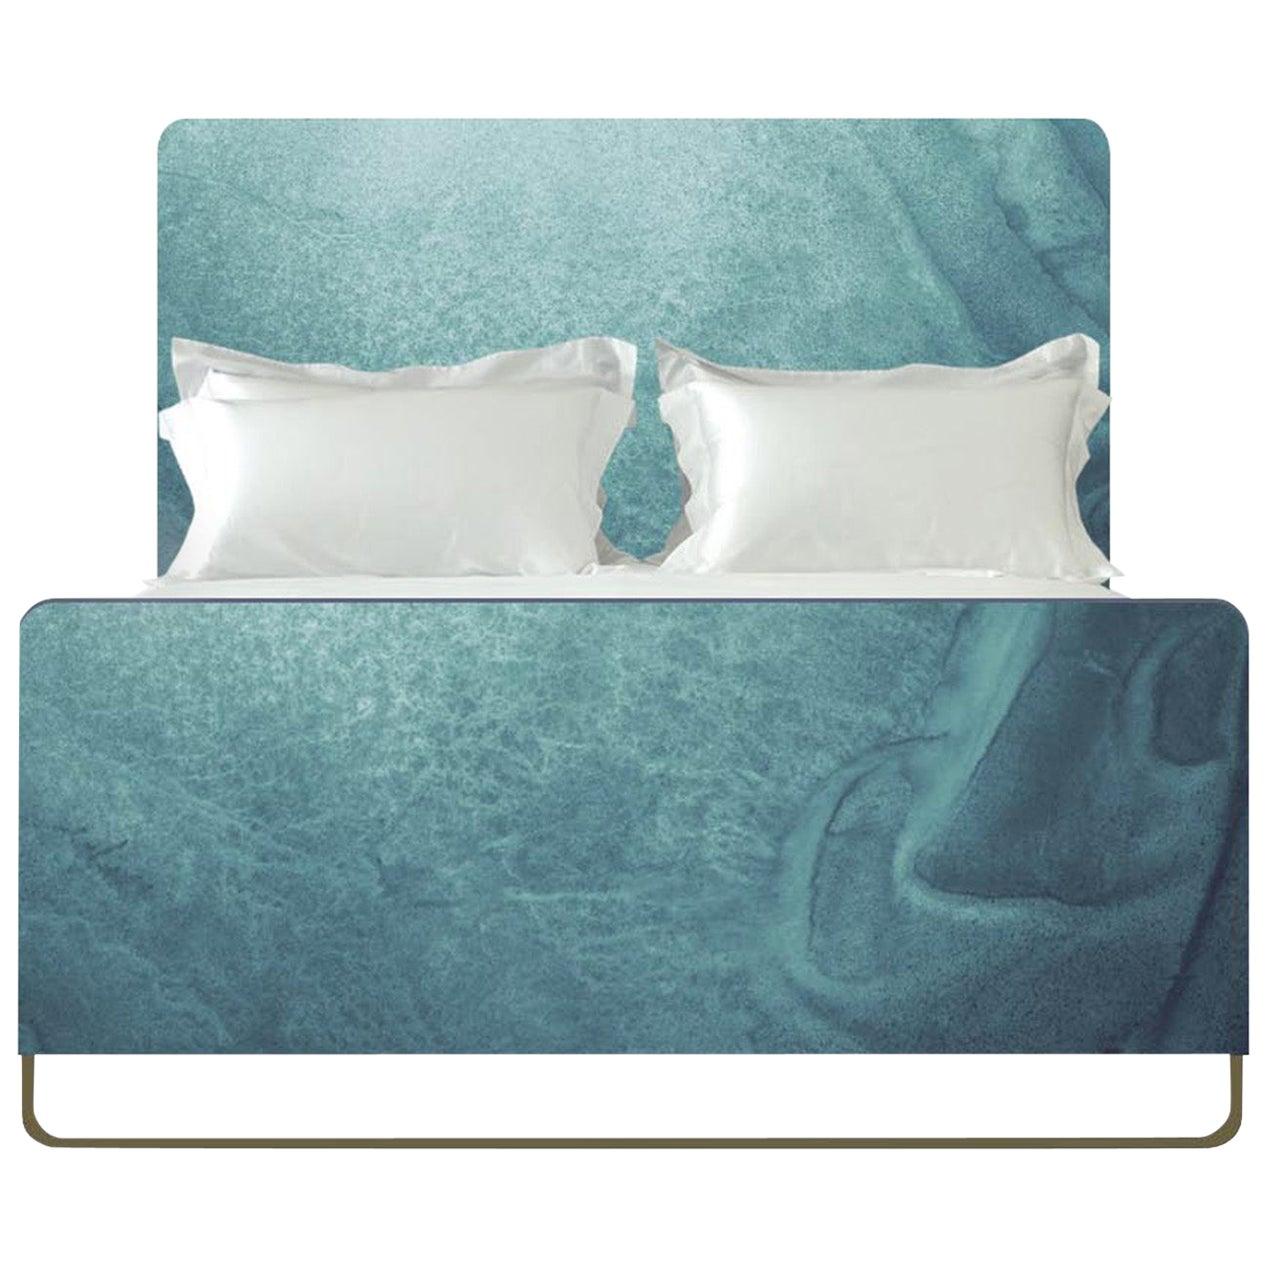 Handcrafted Savoir Ocean & Nº3 Bed Set, King Size